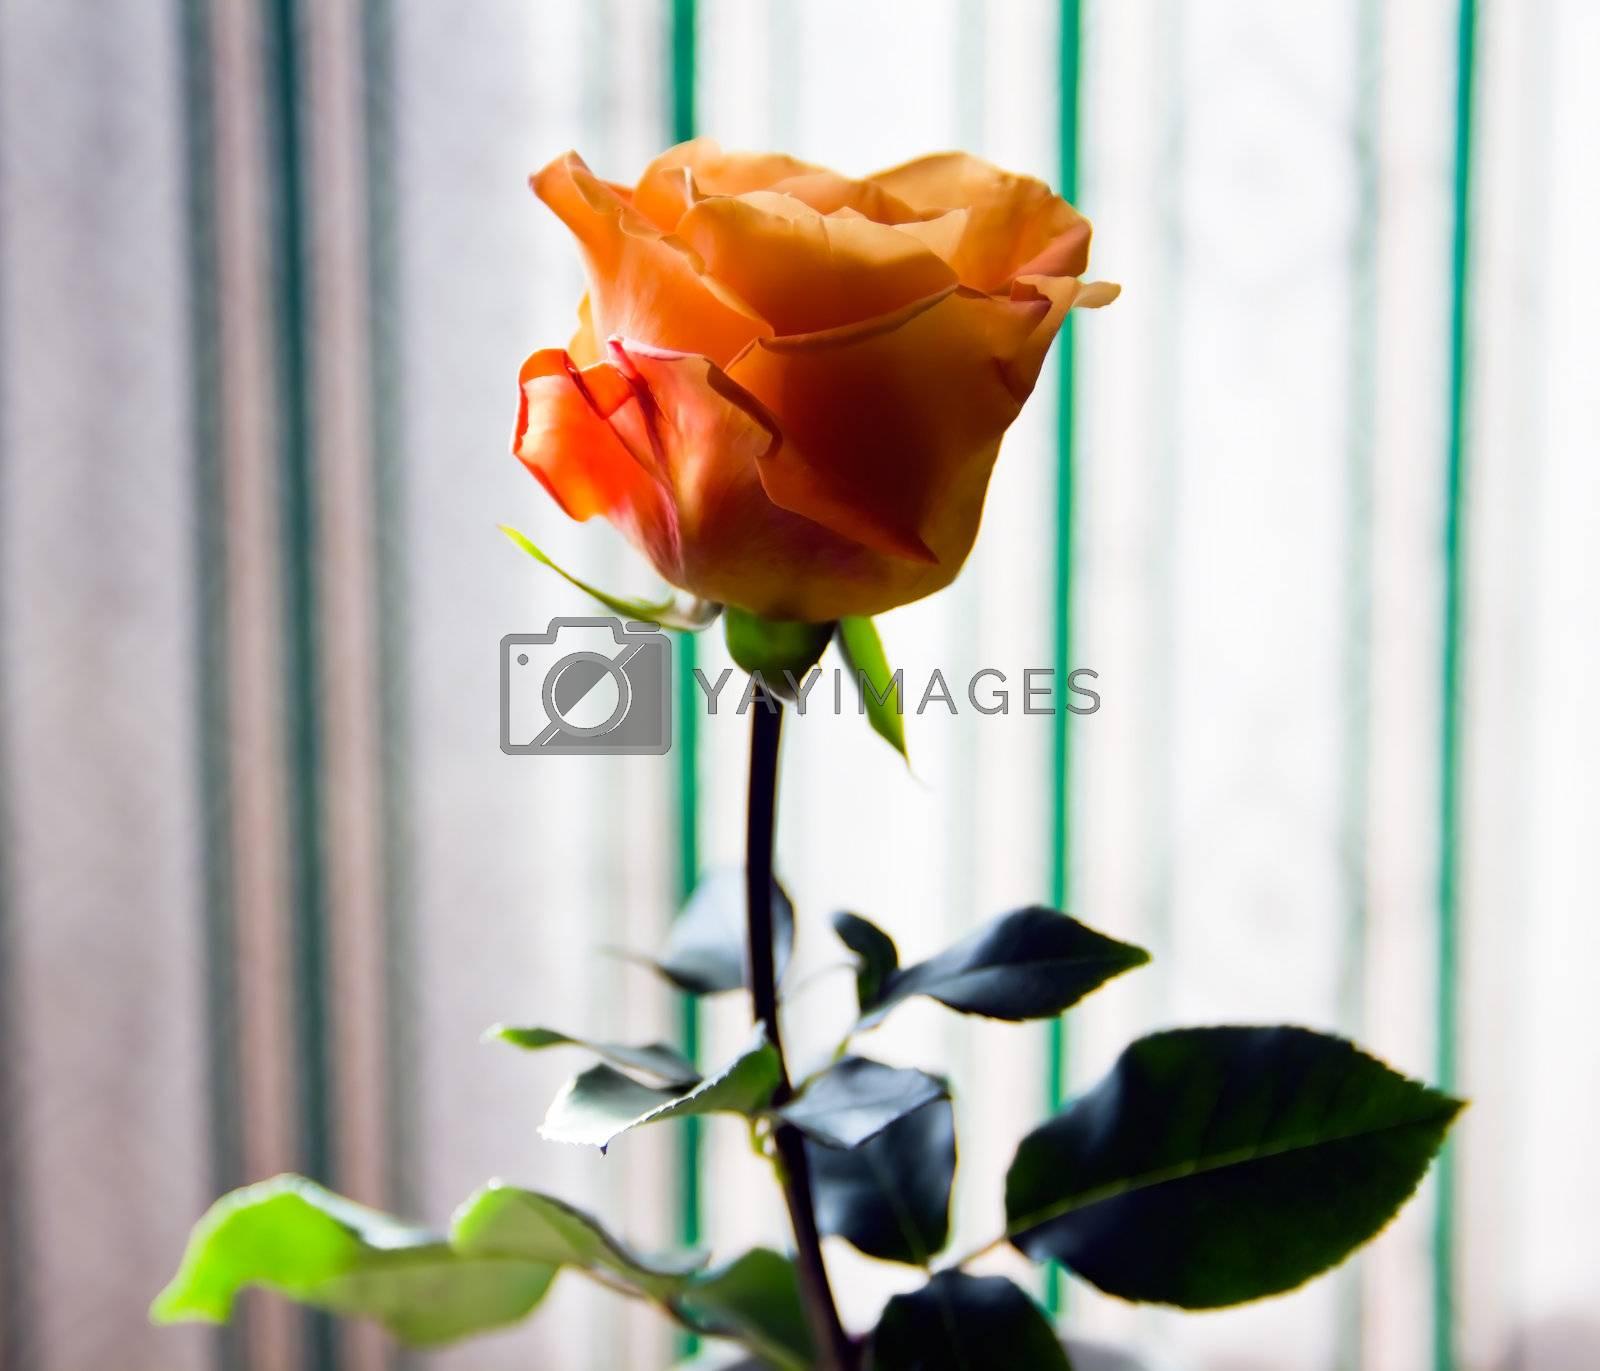 orange rose in a Vase on window background